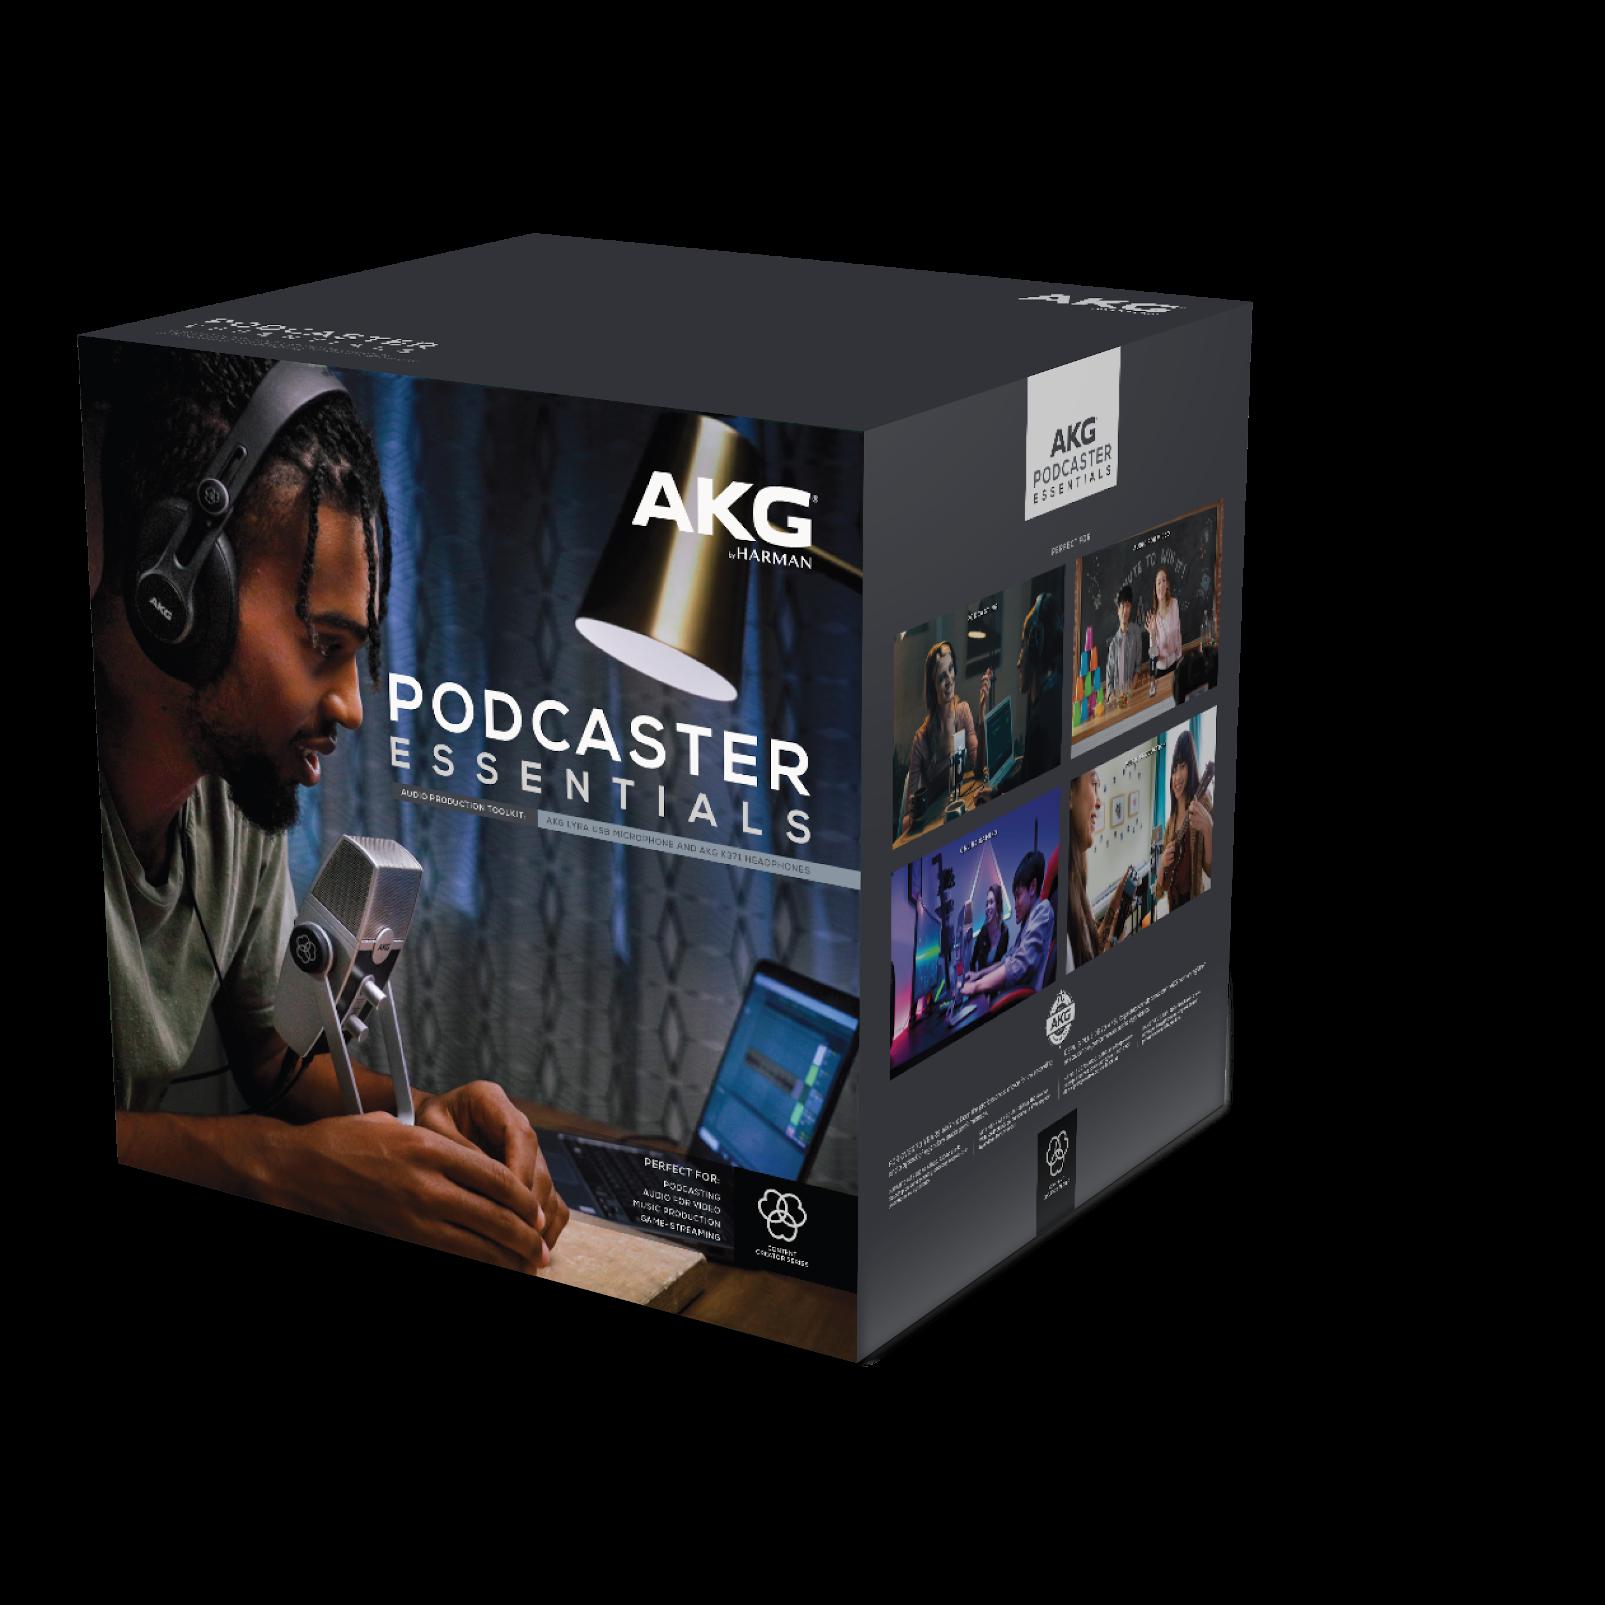 AKG Podcaster Essentials - Black / Gray - Audio Production Toolkit: AKG Lyra USB Microphone and AKG K371 Headphones - Detailshot 1